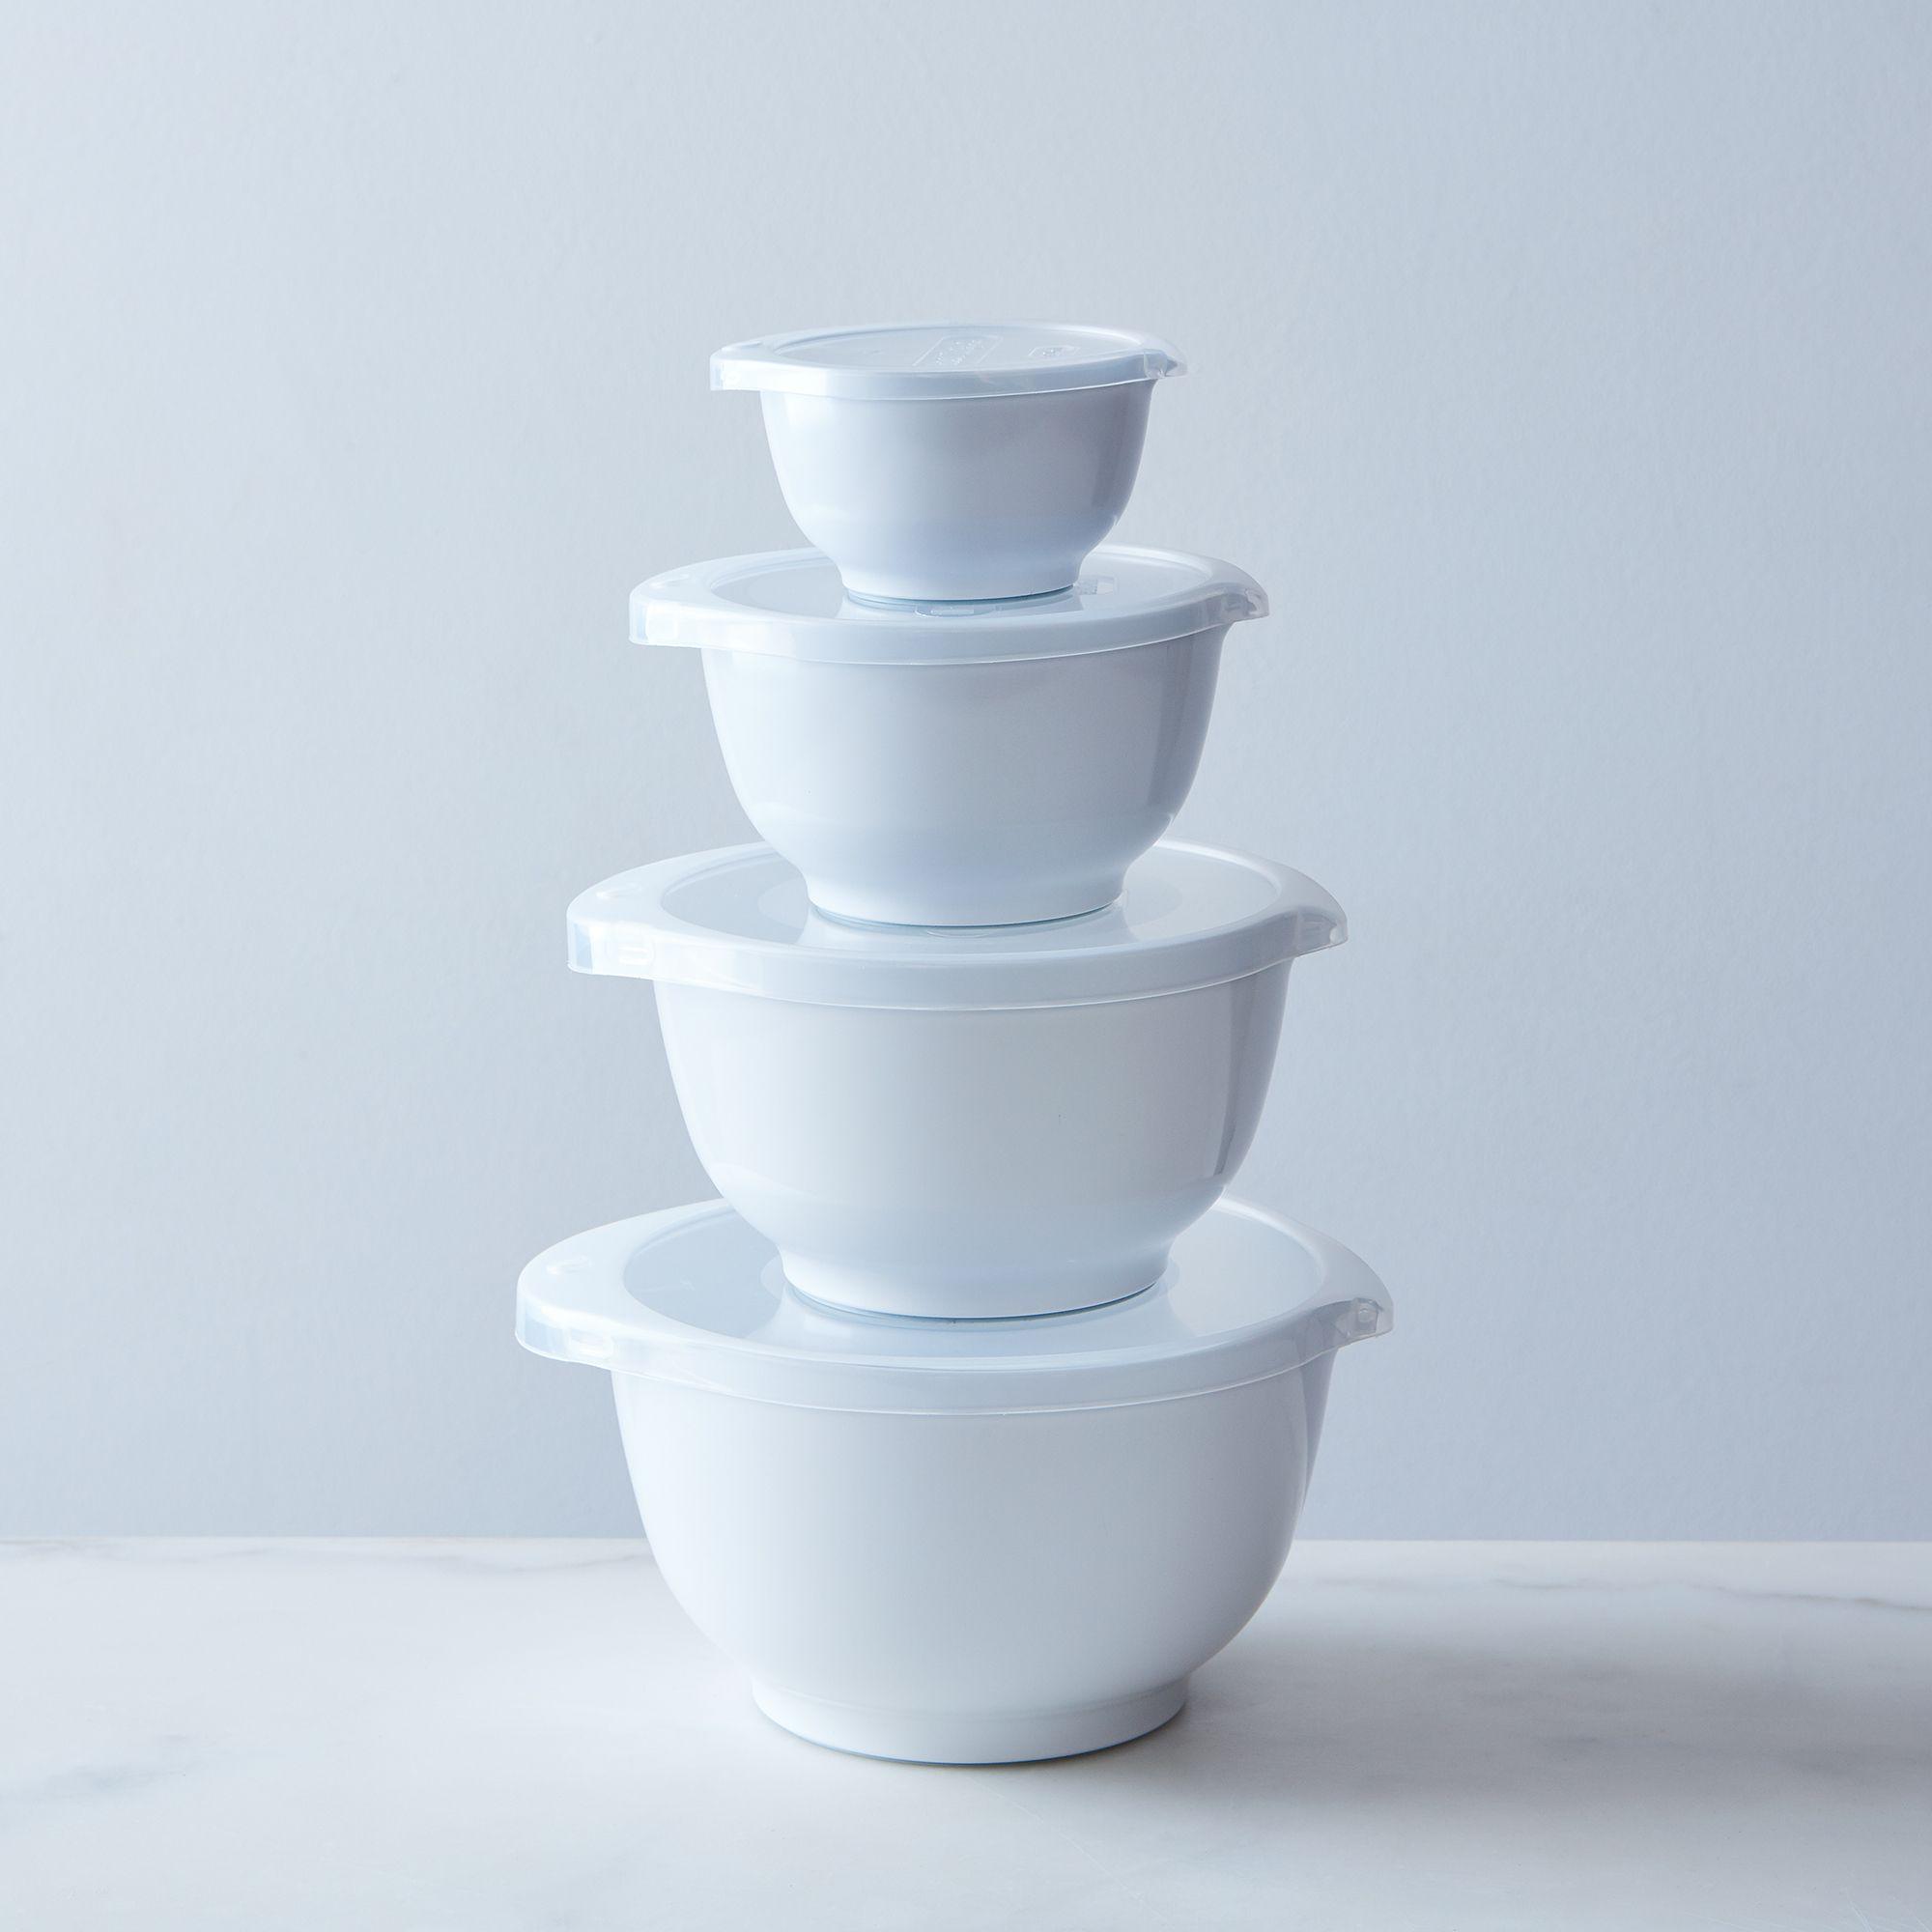 Ae644c8e a0e5 43f1 bd3f 9184f9fa2577  2016 0824 rosti tower mini mixing bowl set silo mark weinberg 140